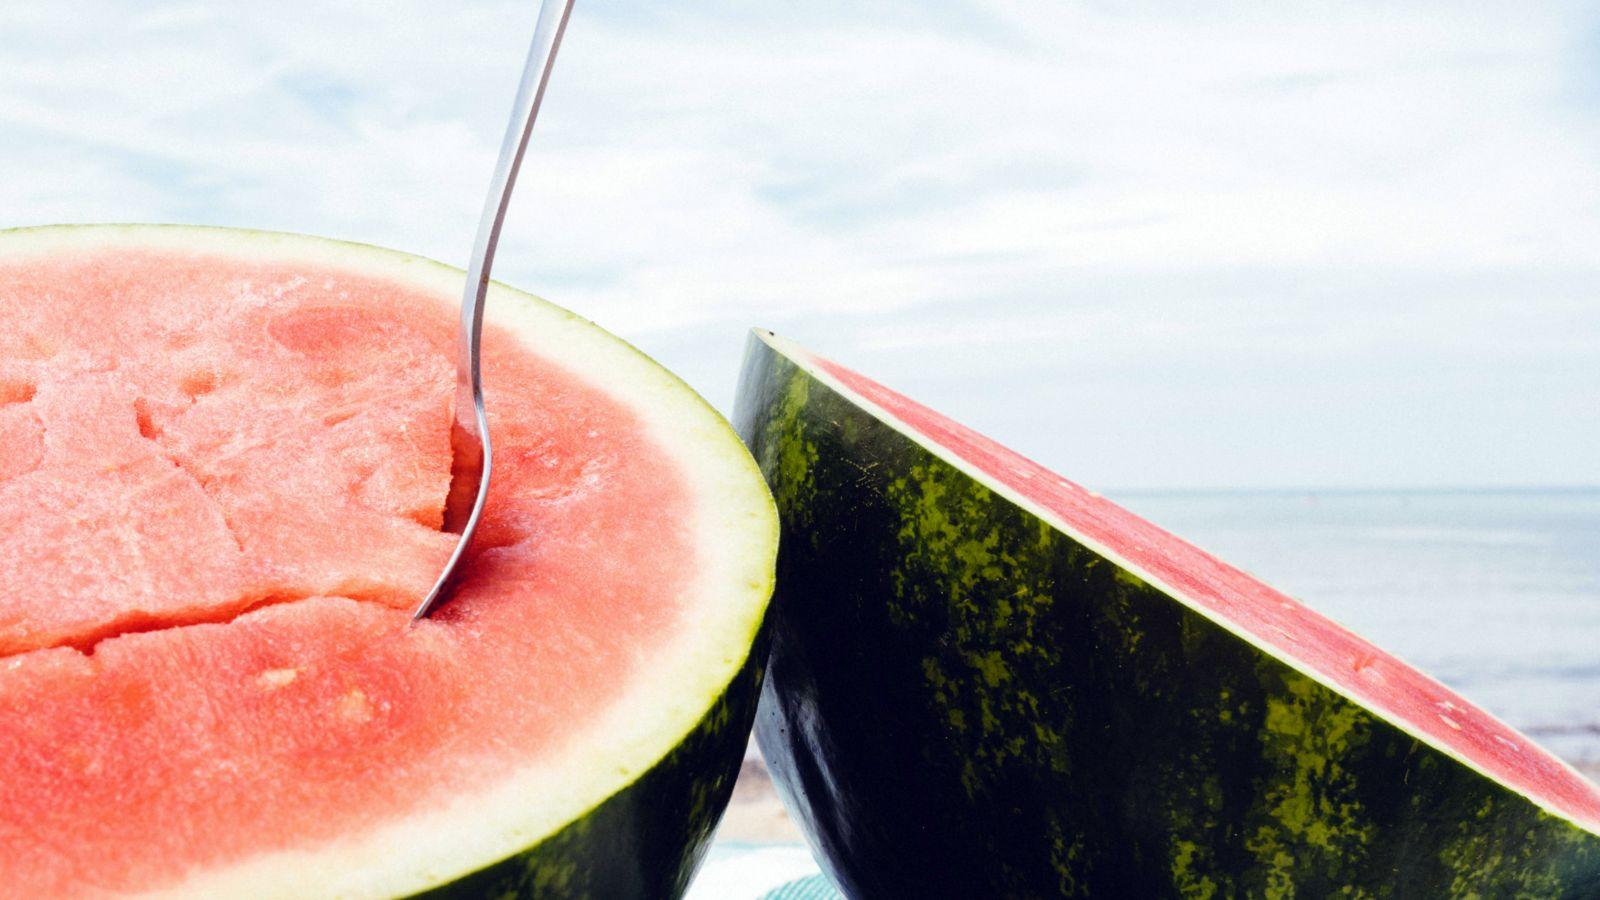 Harry Styles Watermelon Sugar: Ένα τραγούδι αφιερωμένο στο άγγιγμα και στο καρπούζι [vid]